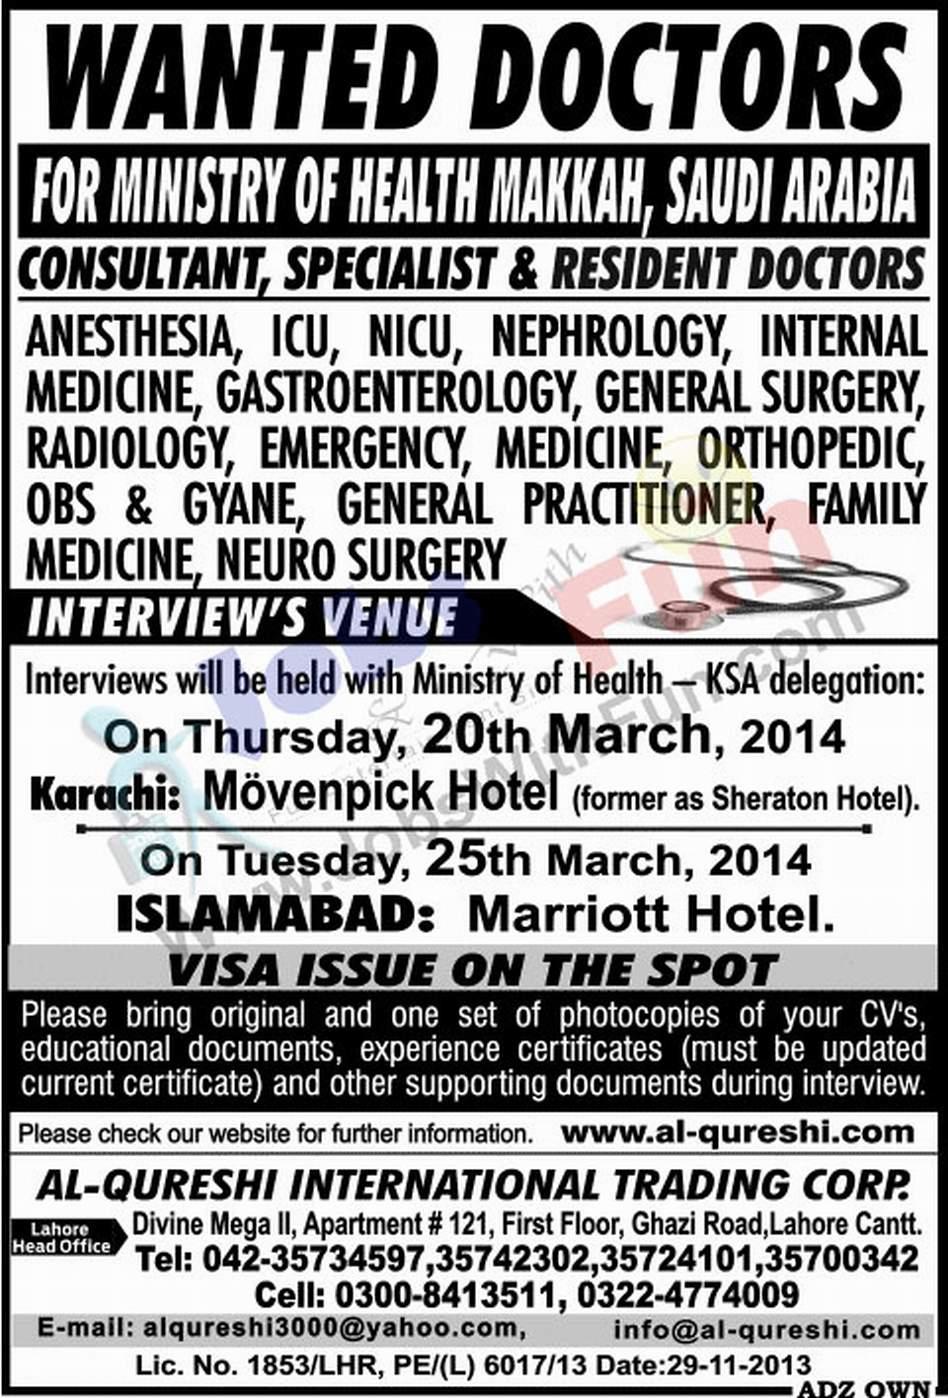 Wanted Doctors For Ministry Of Health Makkah Saudi Arabia